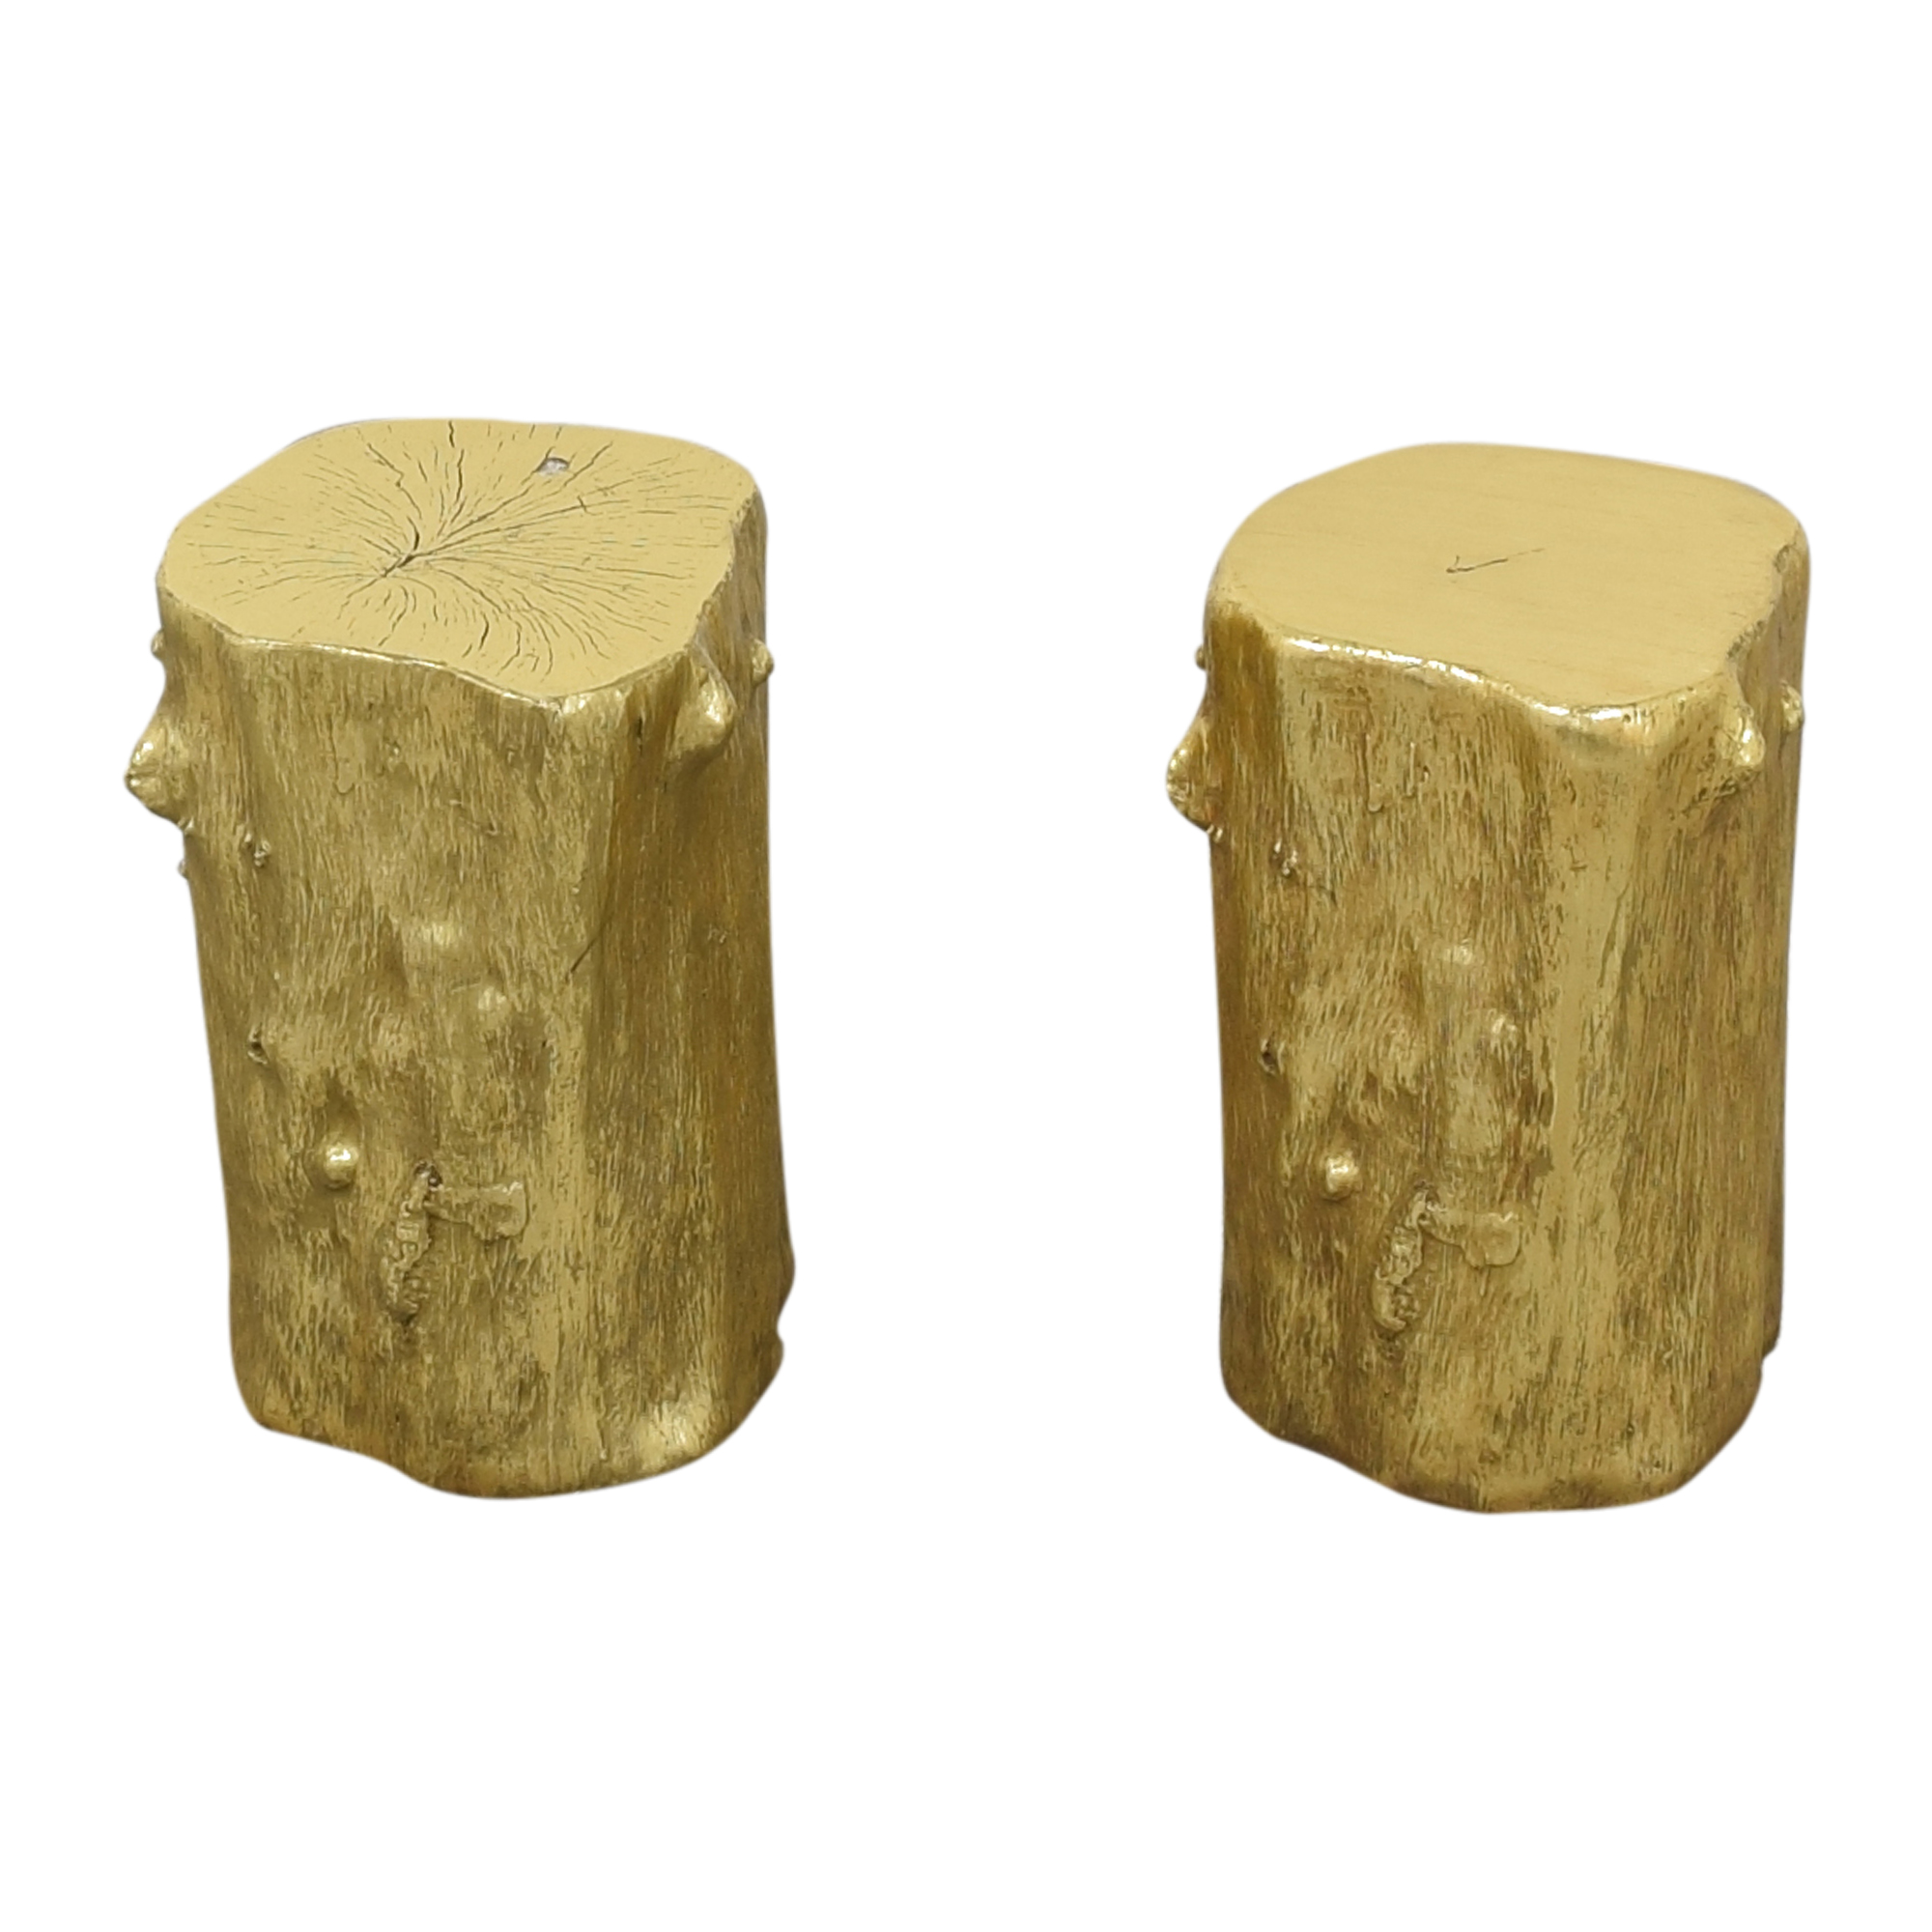 Decorative Log Stools